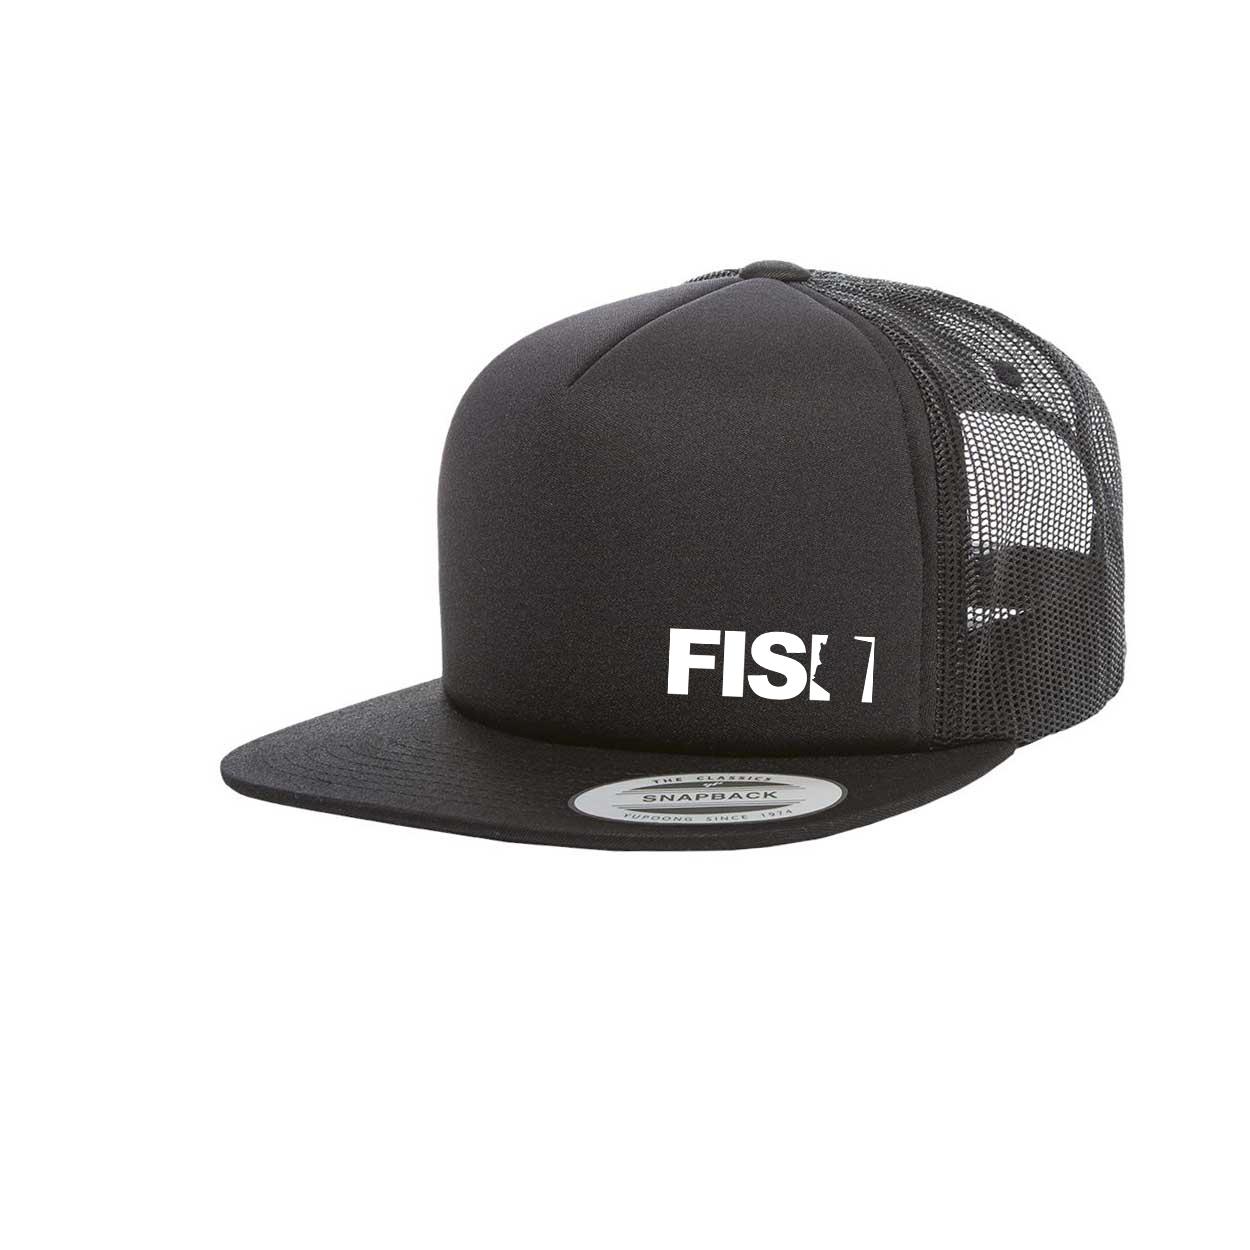 Fish Arizona Night Out Premium Foam Flat Brim Snapback Hat Black (White Logo)